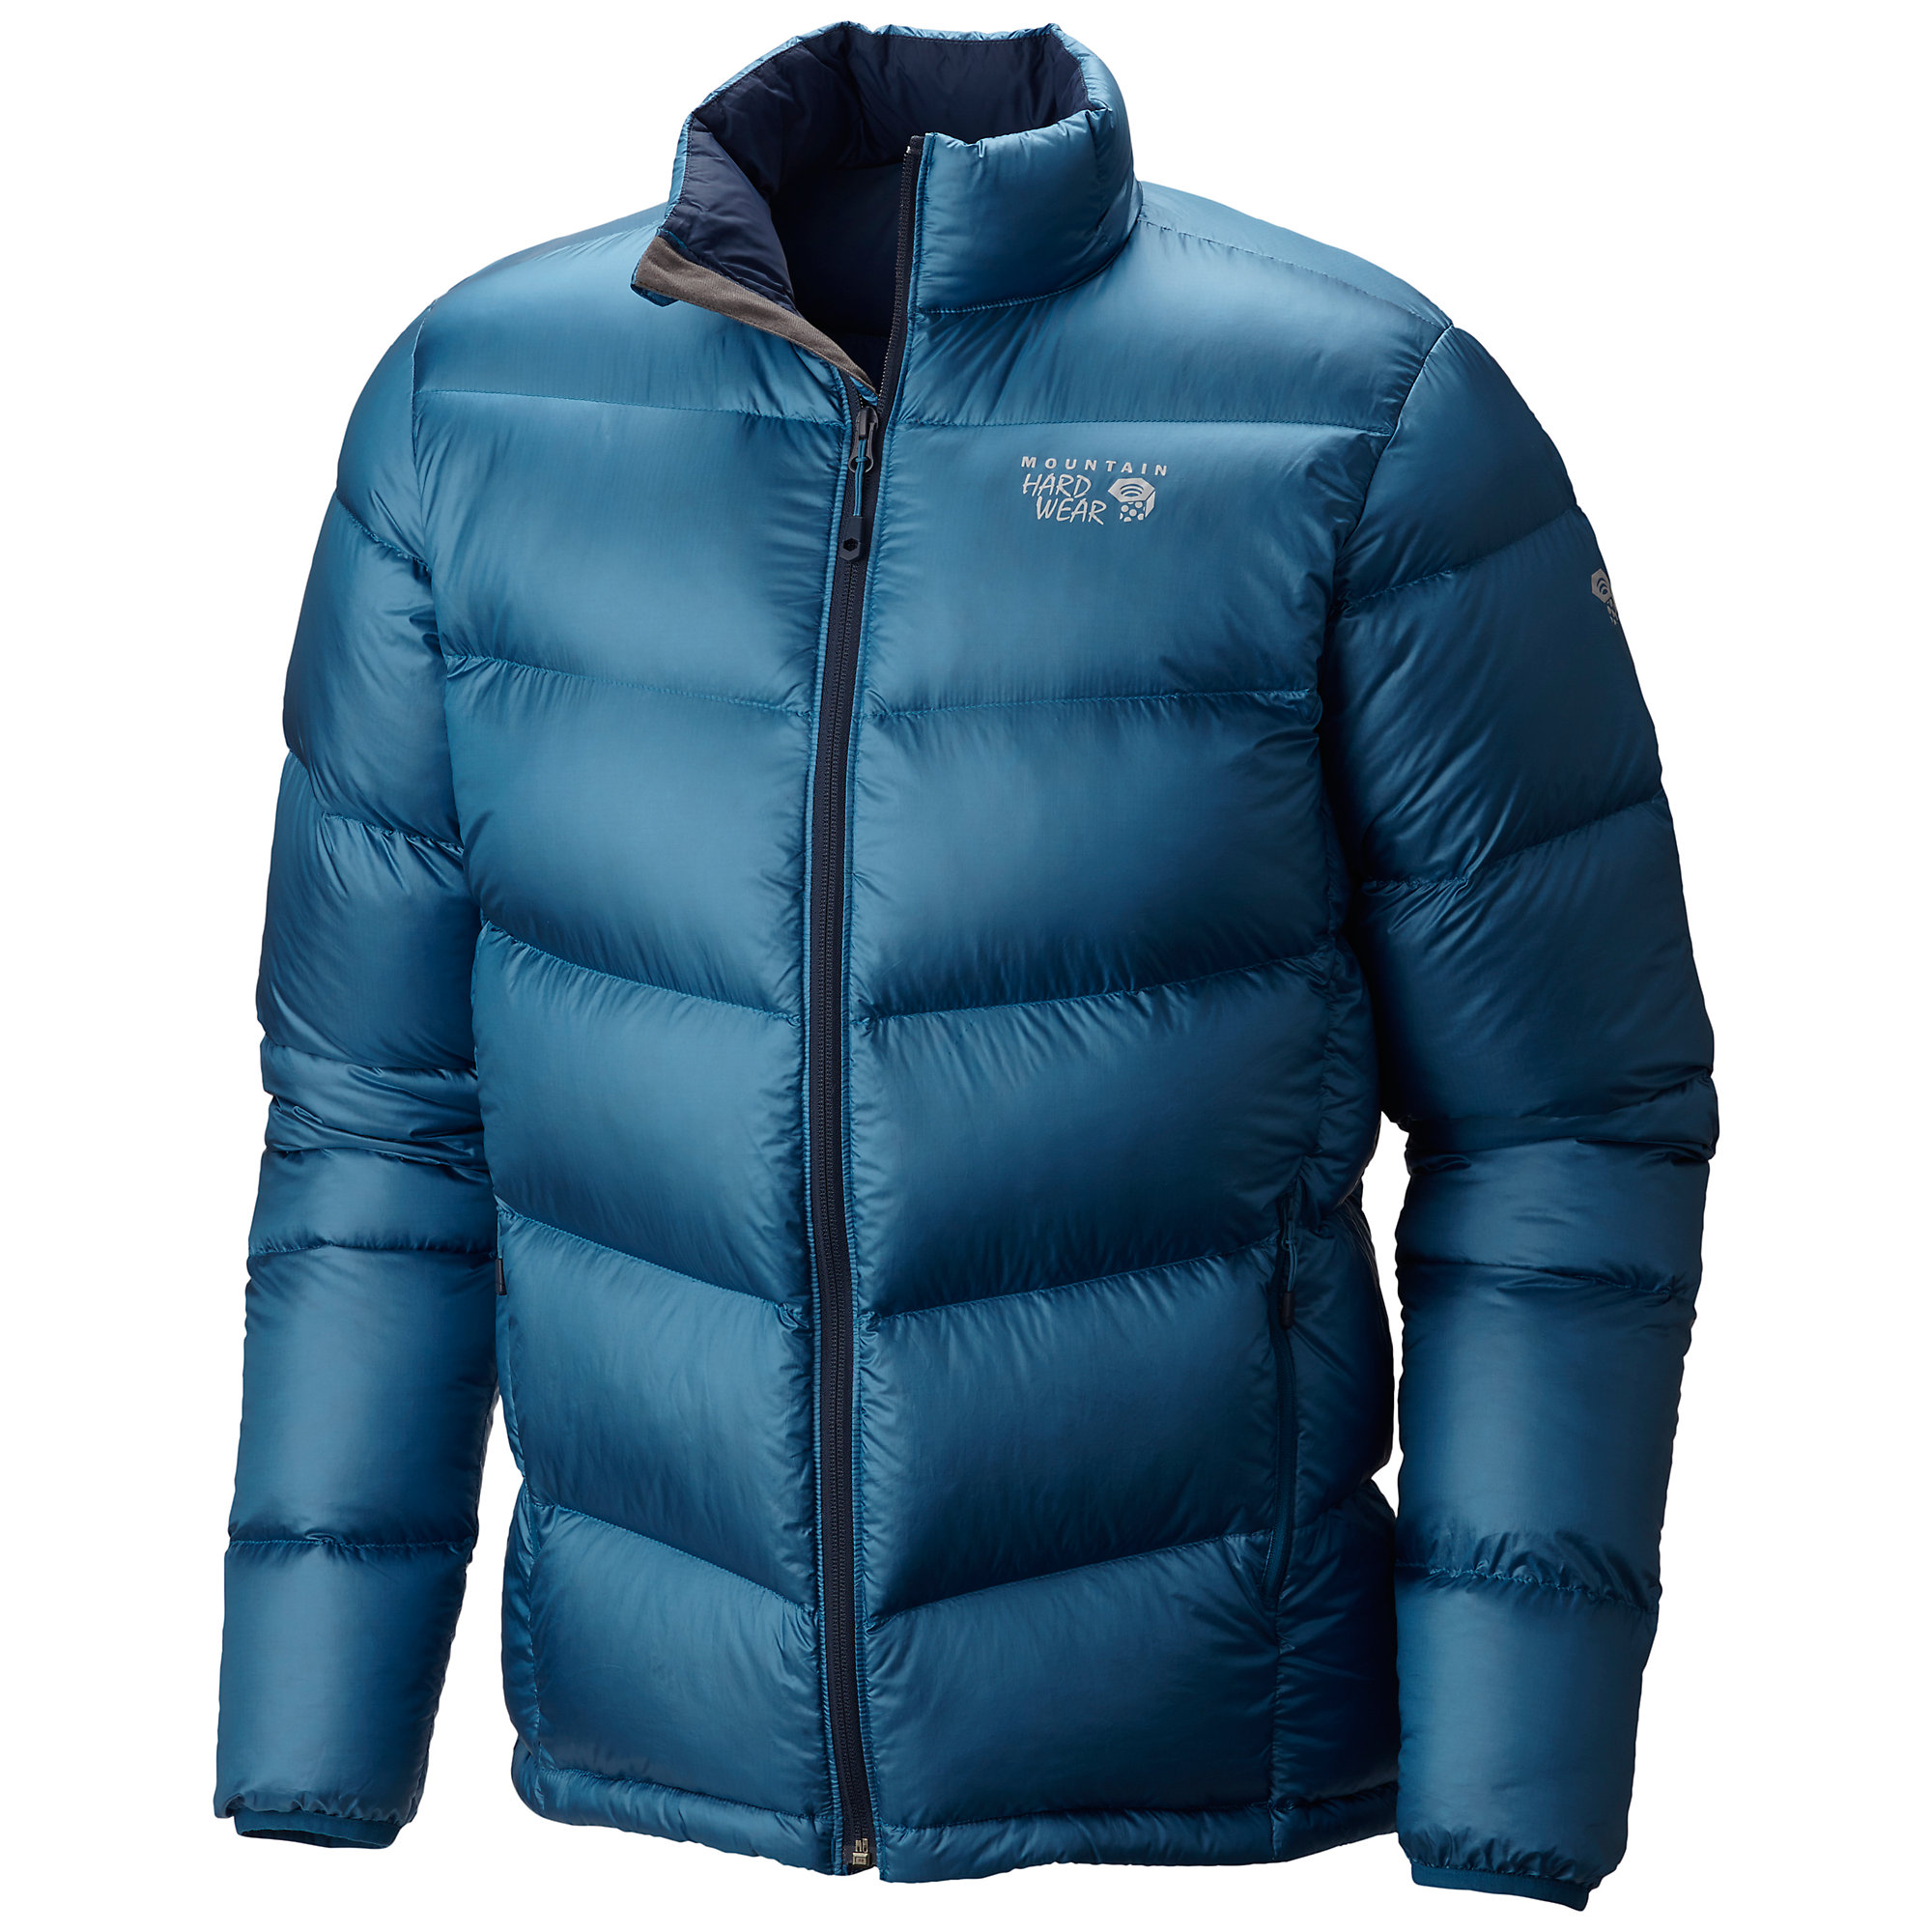 photo: Mountain Hardwear Men's Kelvinator Jacket